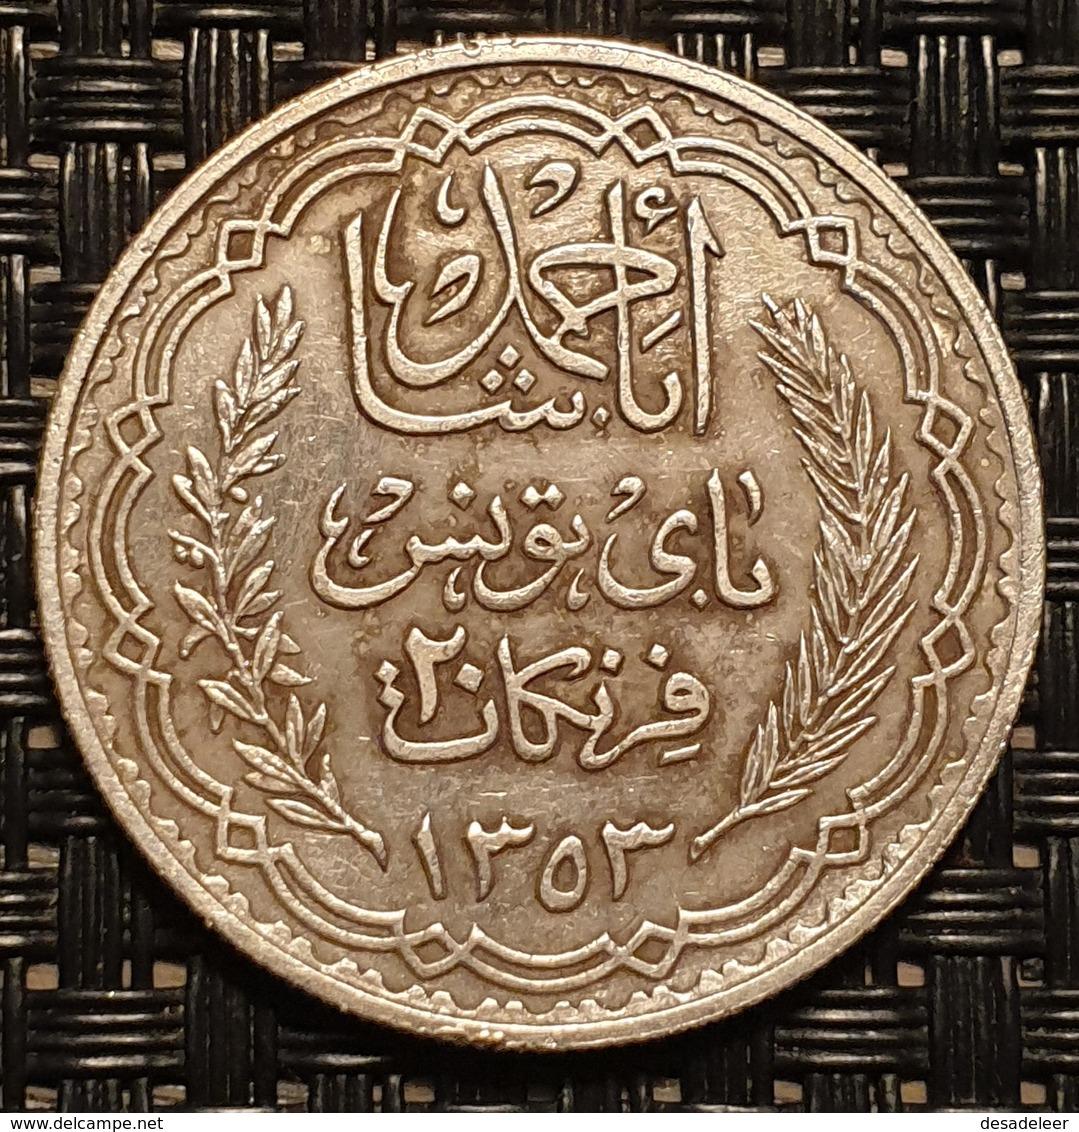 Tunisia 20 Francs 1934 (year 1353) - Tunisie